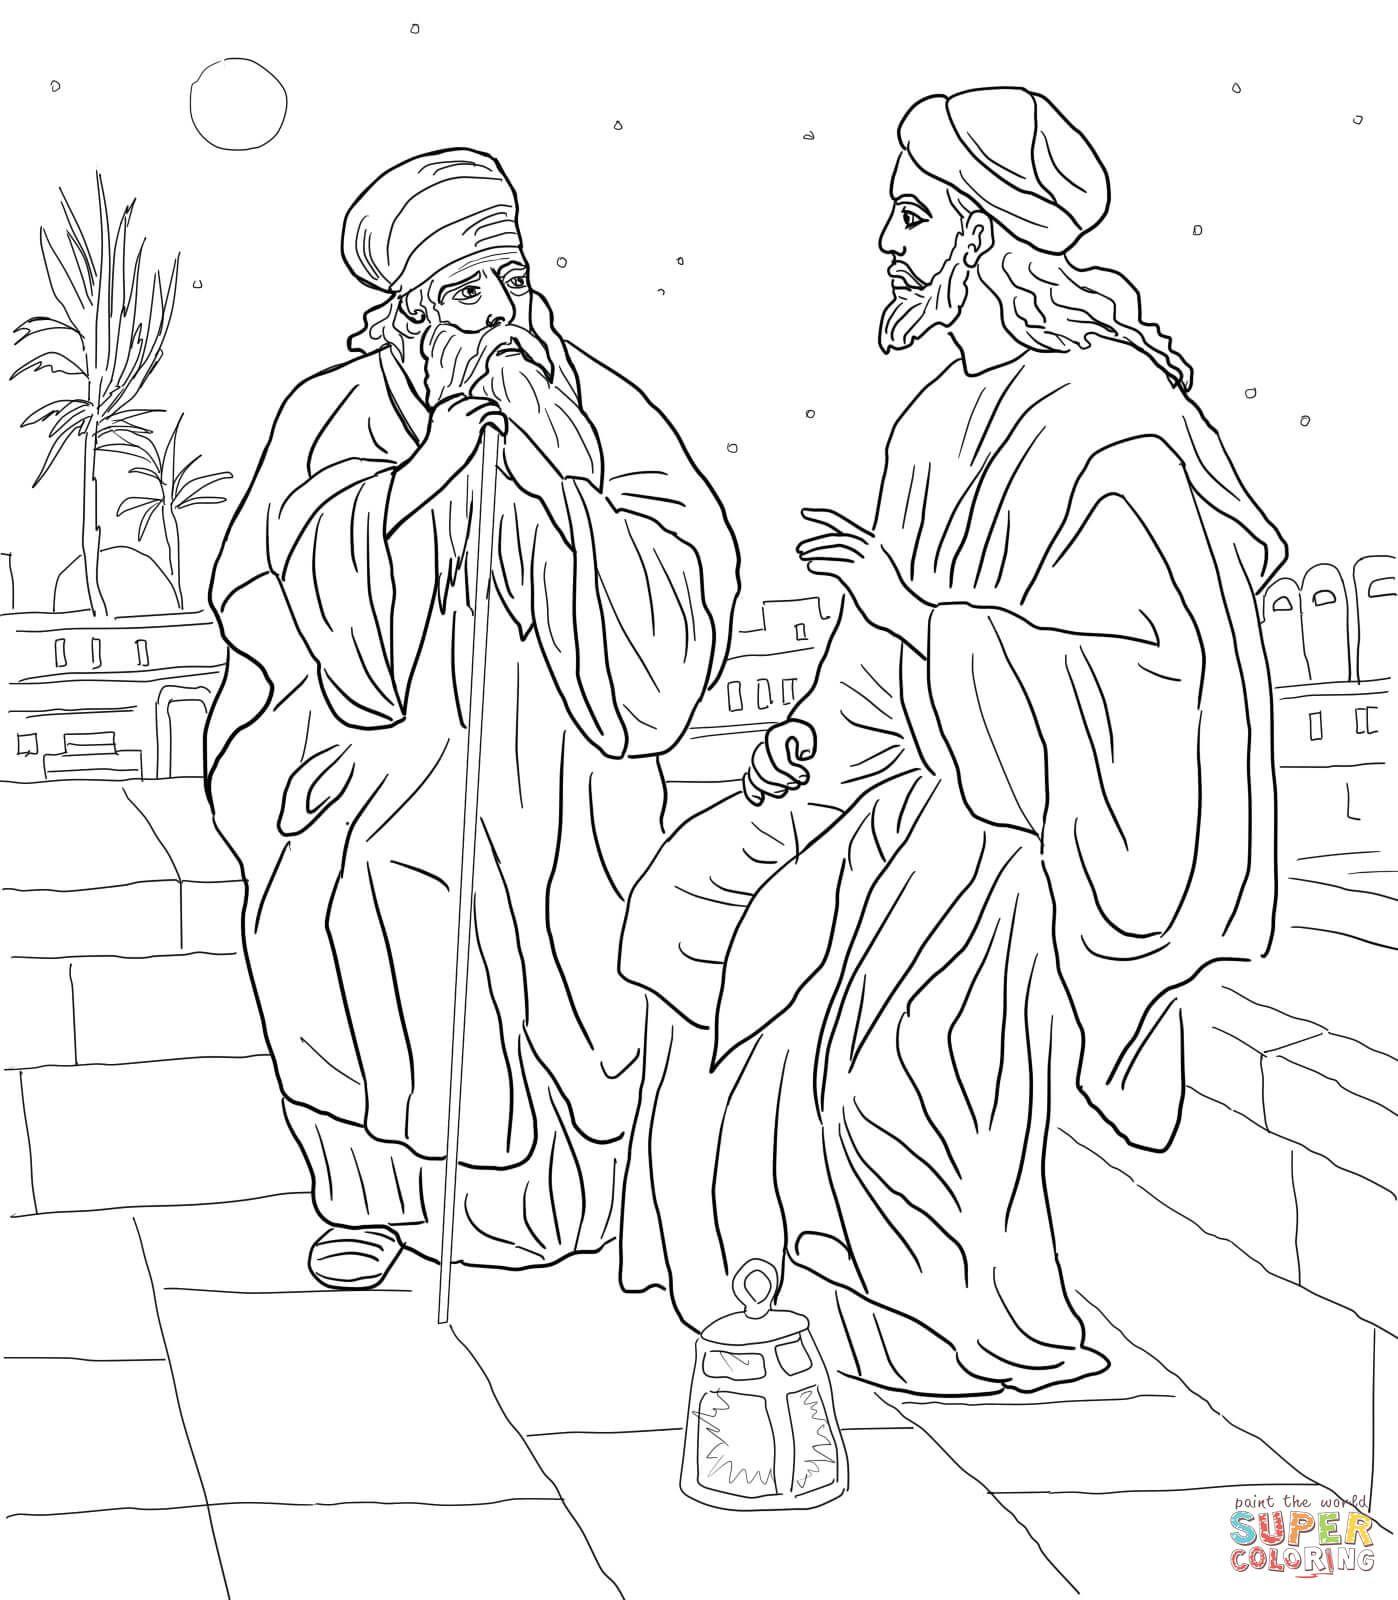 Jesus and Nicodemus | Super Coloring | submerged vbs 2017 | Pinterest